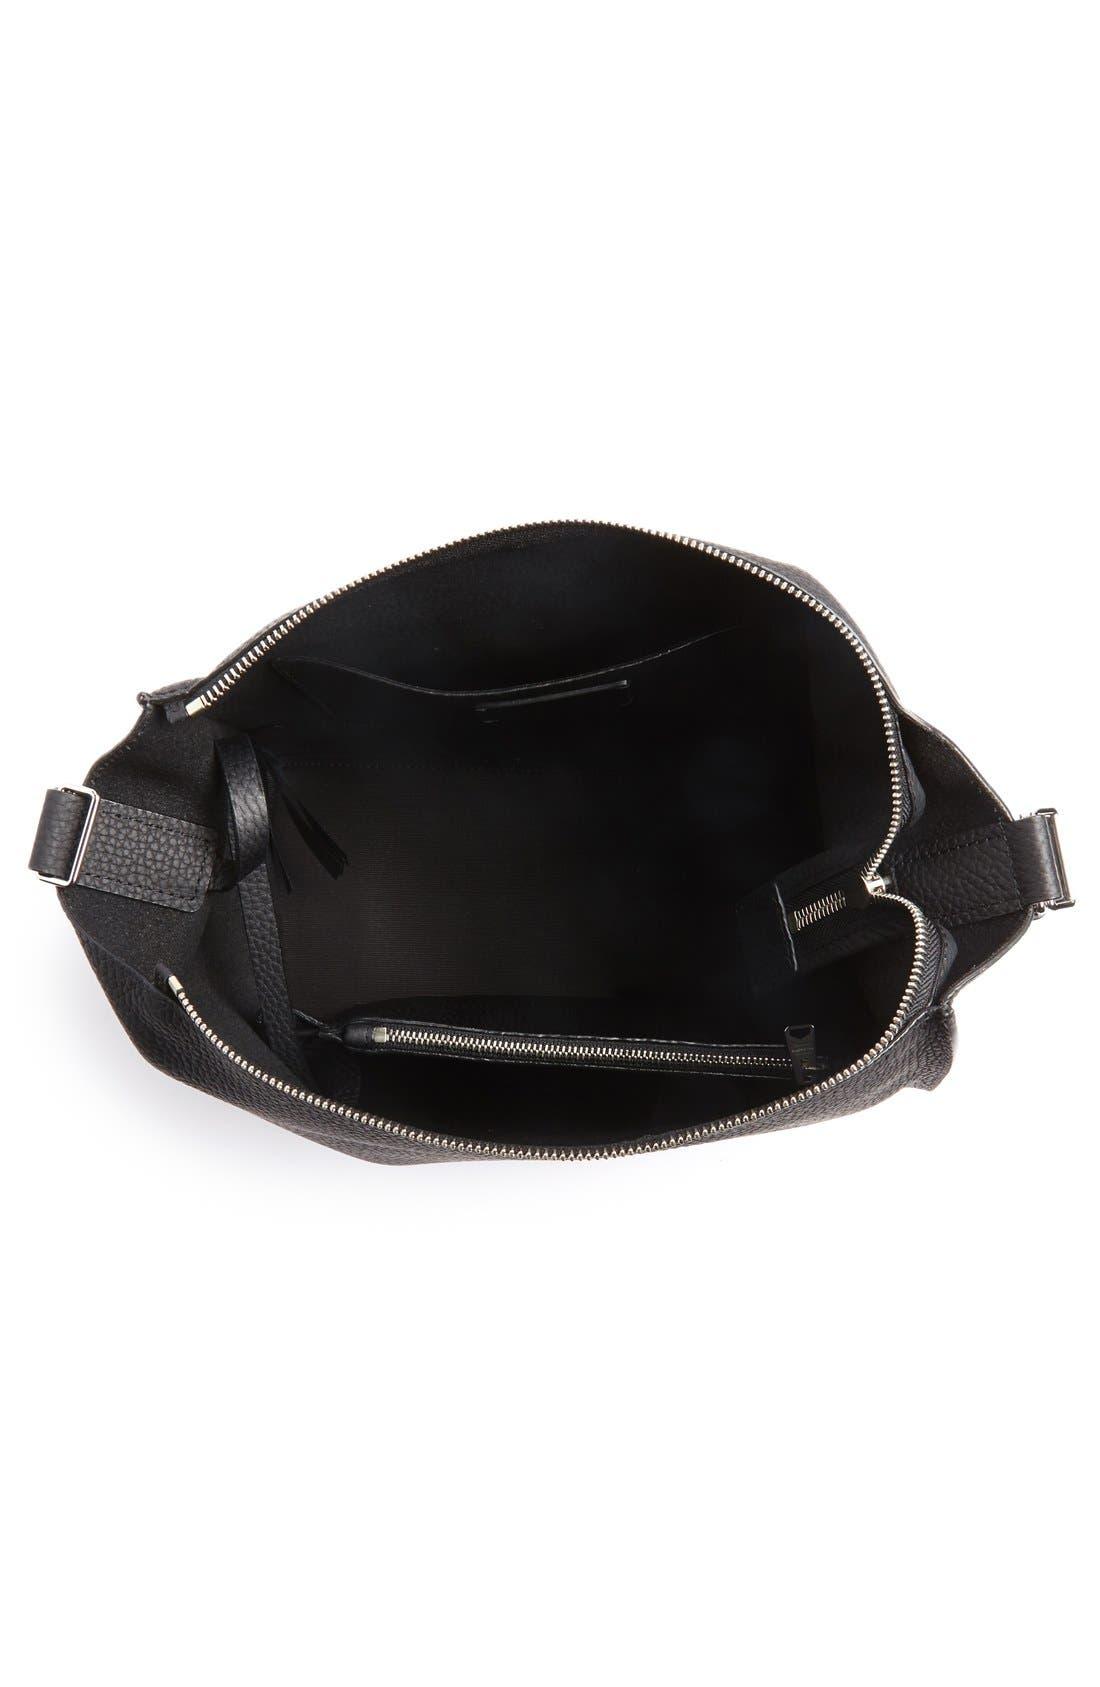 'Kita' Leather Shoulder/Crossbody Bag,                             Alternate thumbnail 4, color,                             BLACK